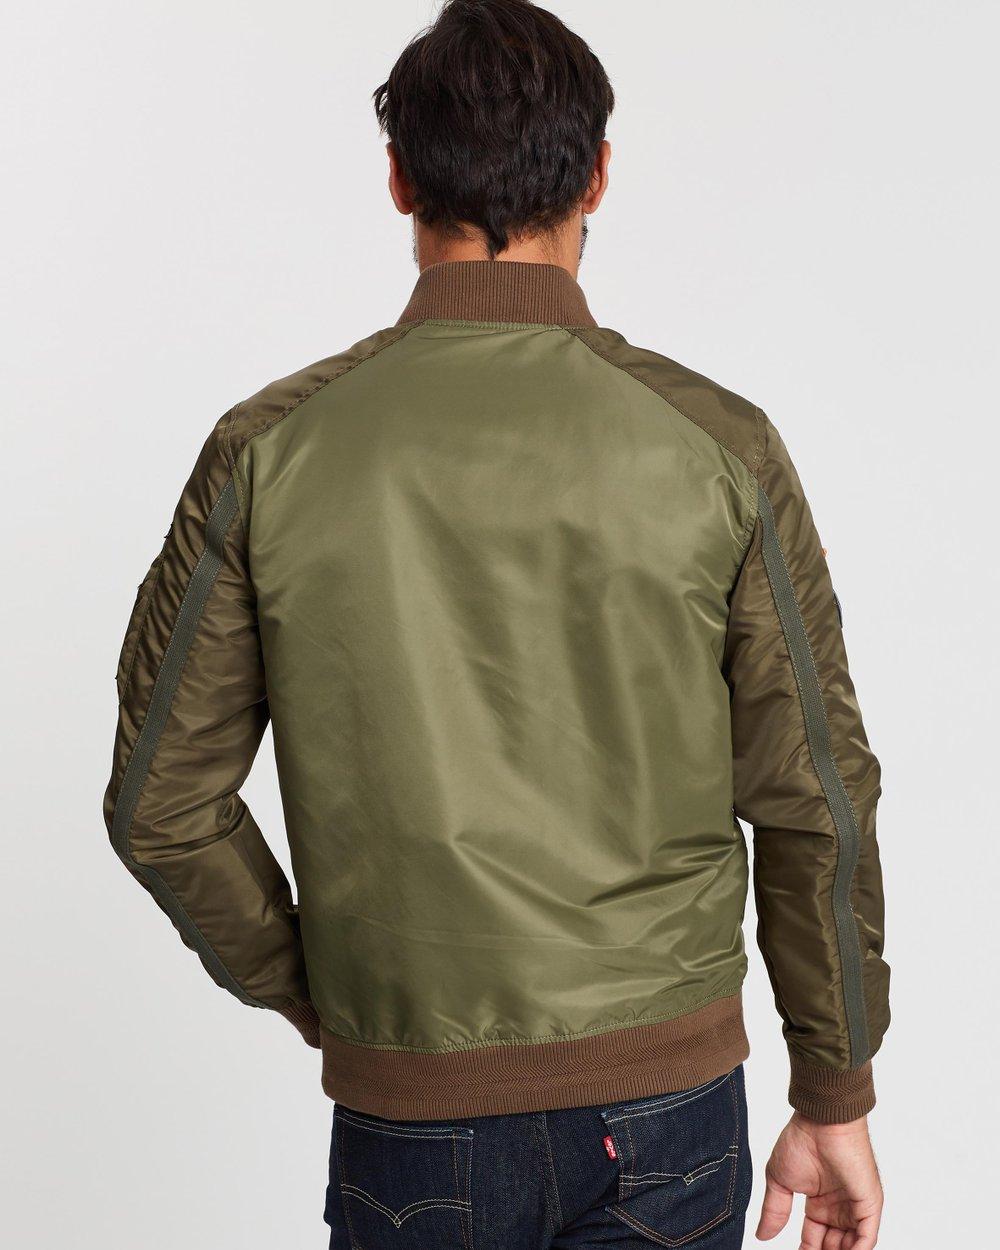 30f1e7d34 Rookie Mixed Bomber Jacket